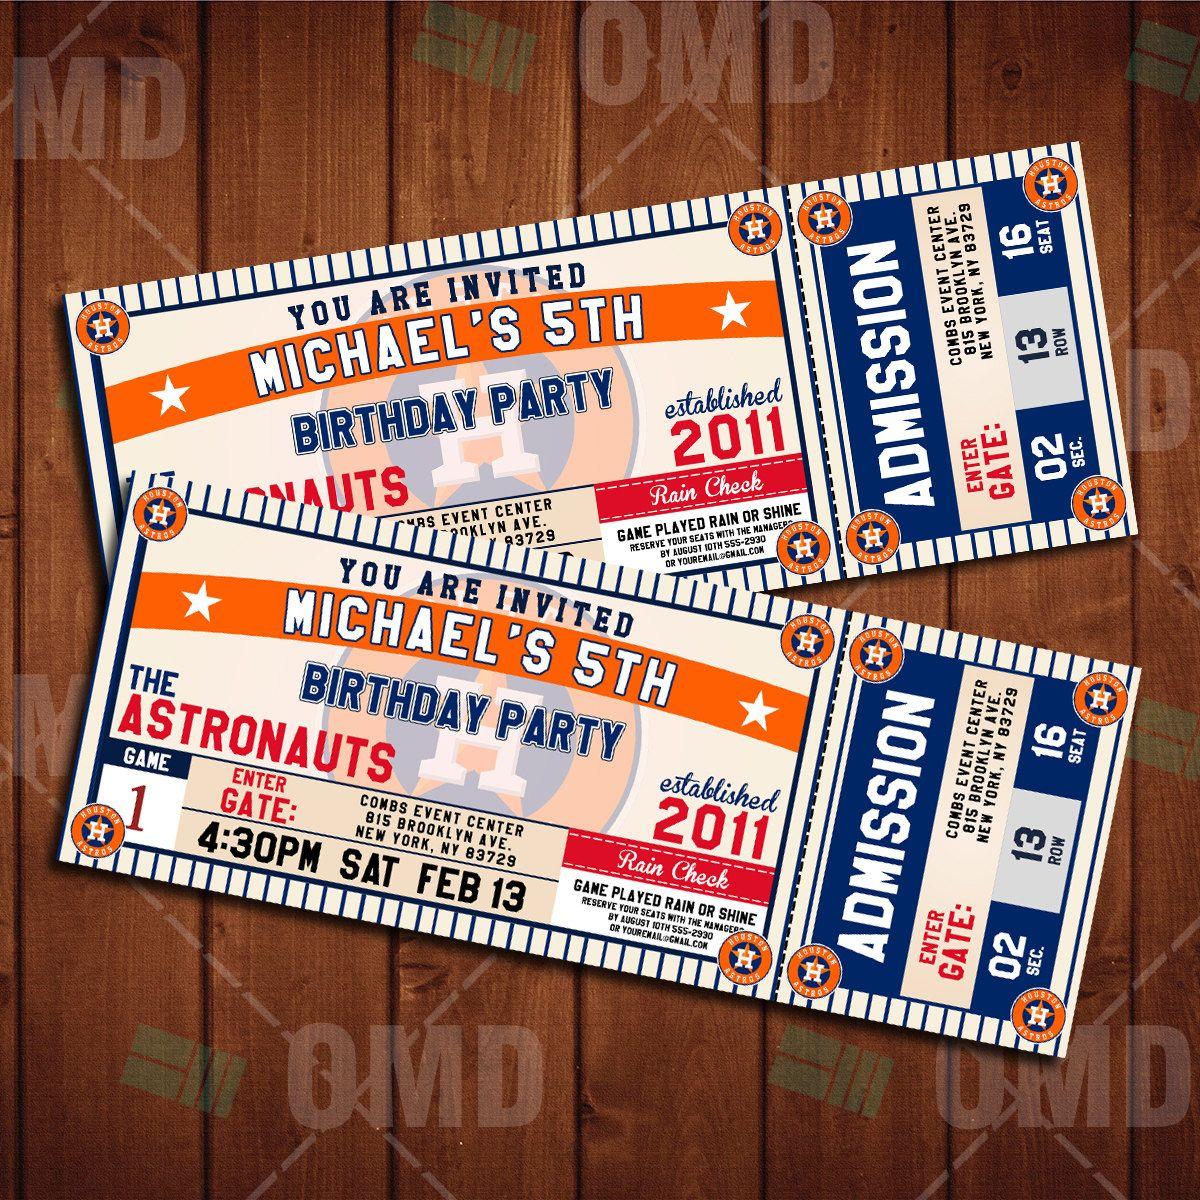 Houston Astros Sports Party Invitation, Sports Tickets Invites, Baseball  Birthday Theme Party Template By Sportsinvites